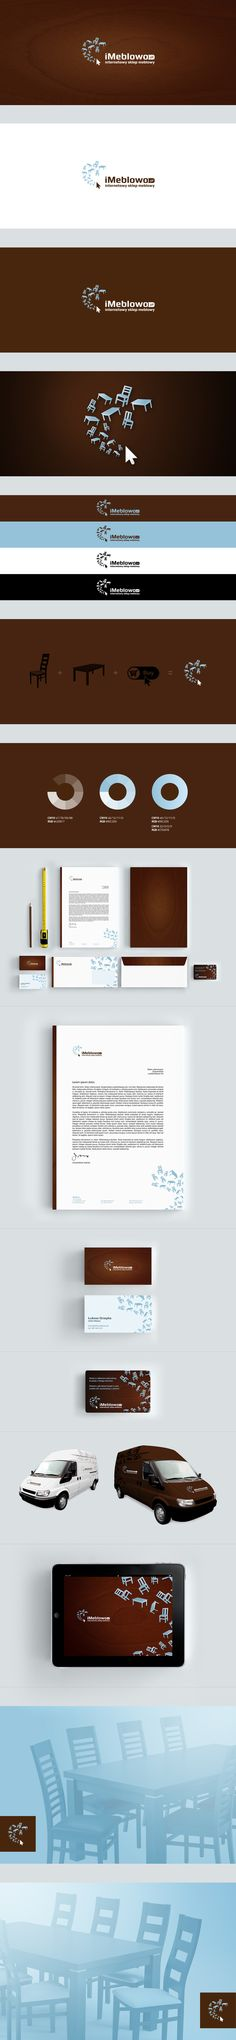 iMeblowo.pl (furniture online shop) - branding by Łukasz Ociepka, via Behance | #stationary #corporate #design #corporatedesign #logo #identity #branding #marketing <<< repinned by an #advertising agency from #Hamburg / #Germany - www.BlickeDeeler.de | Follow us on www.facebook.com/BlickeDeeler